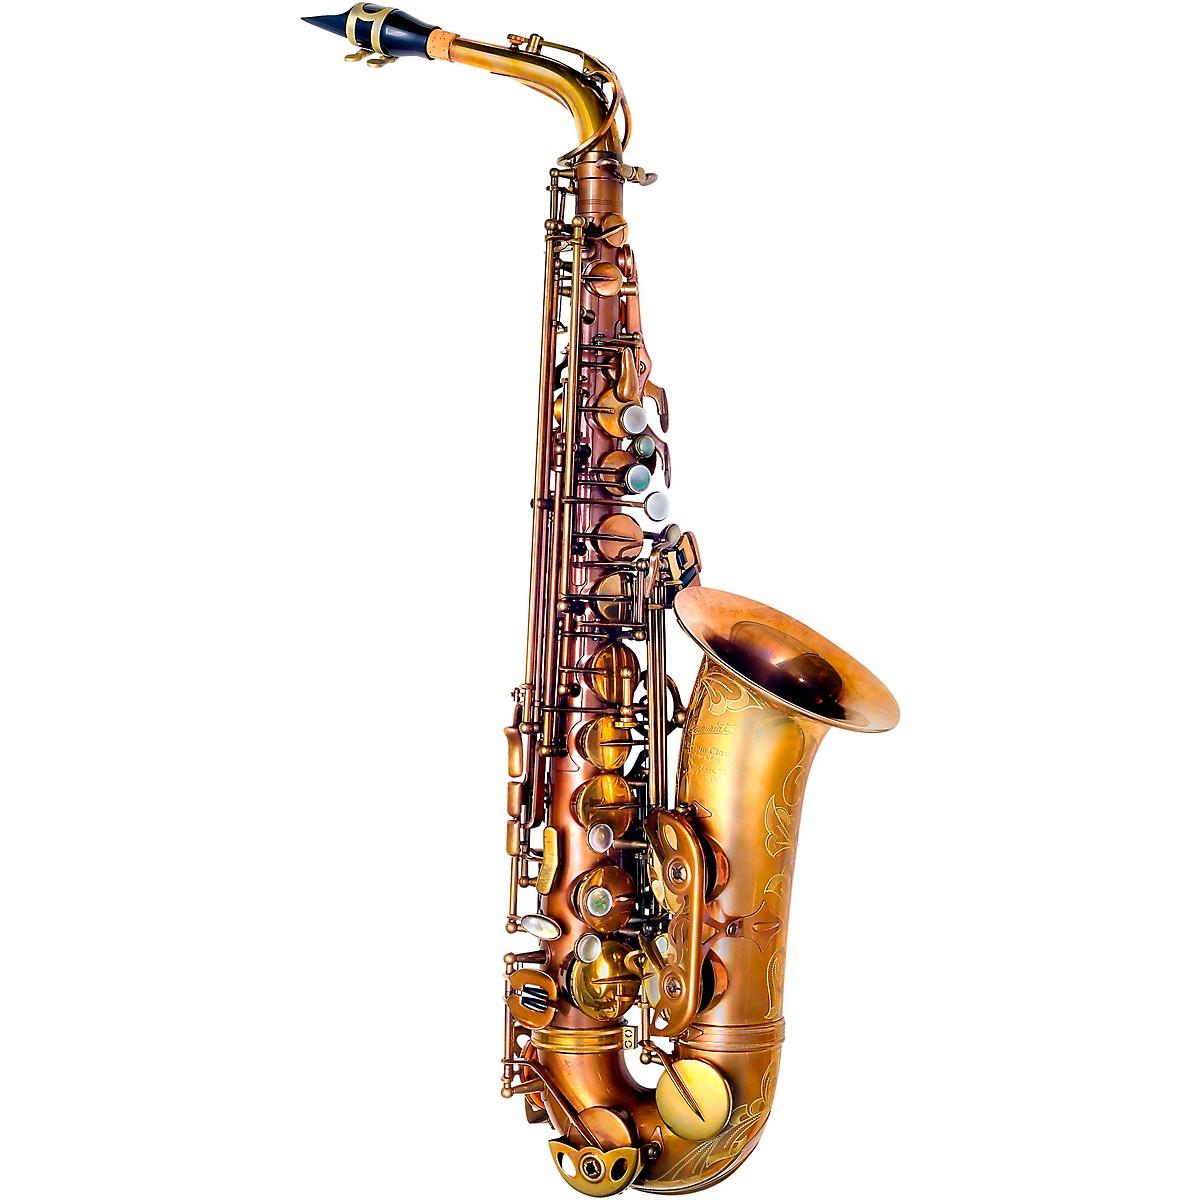 P. Mauriat System 76 Professional Alto Saxophone